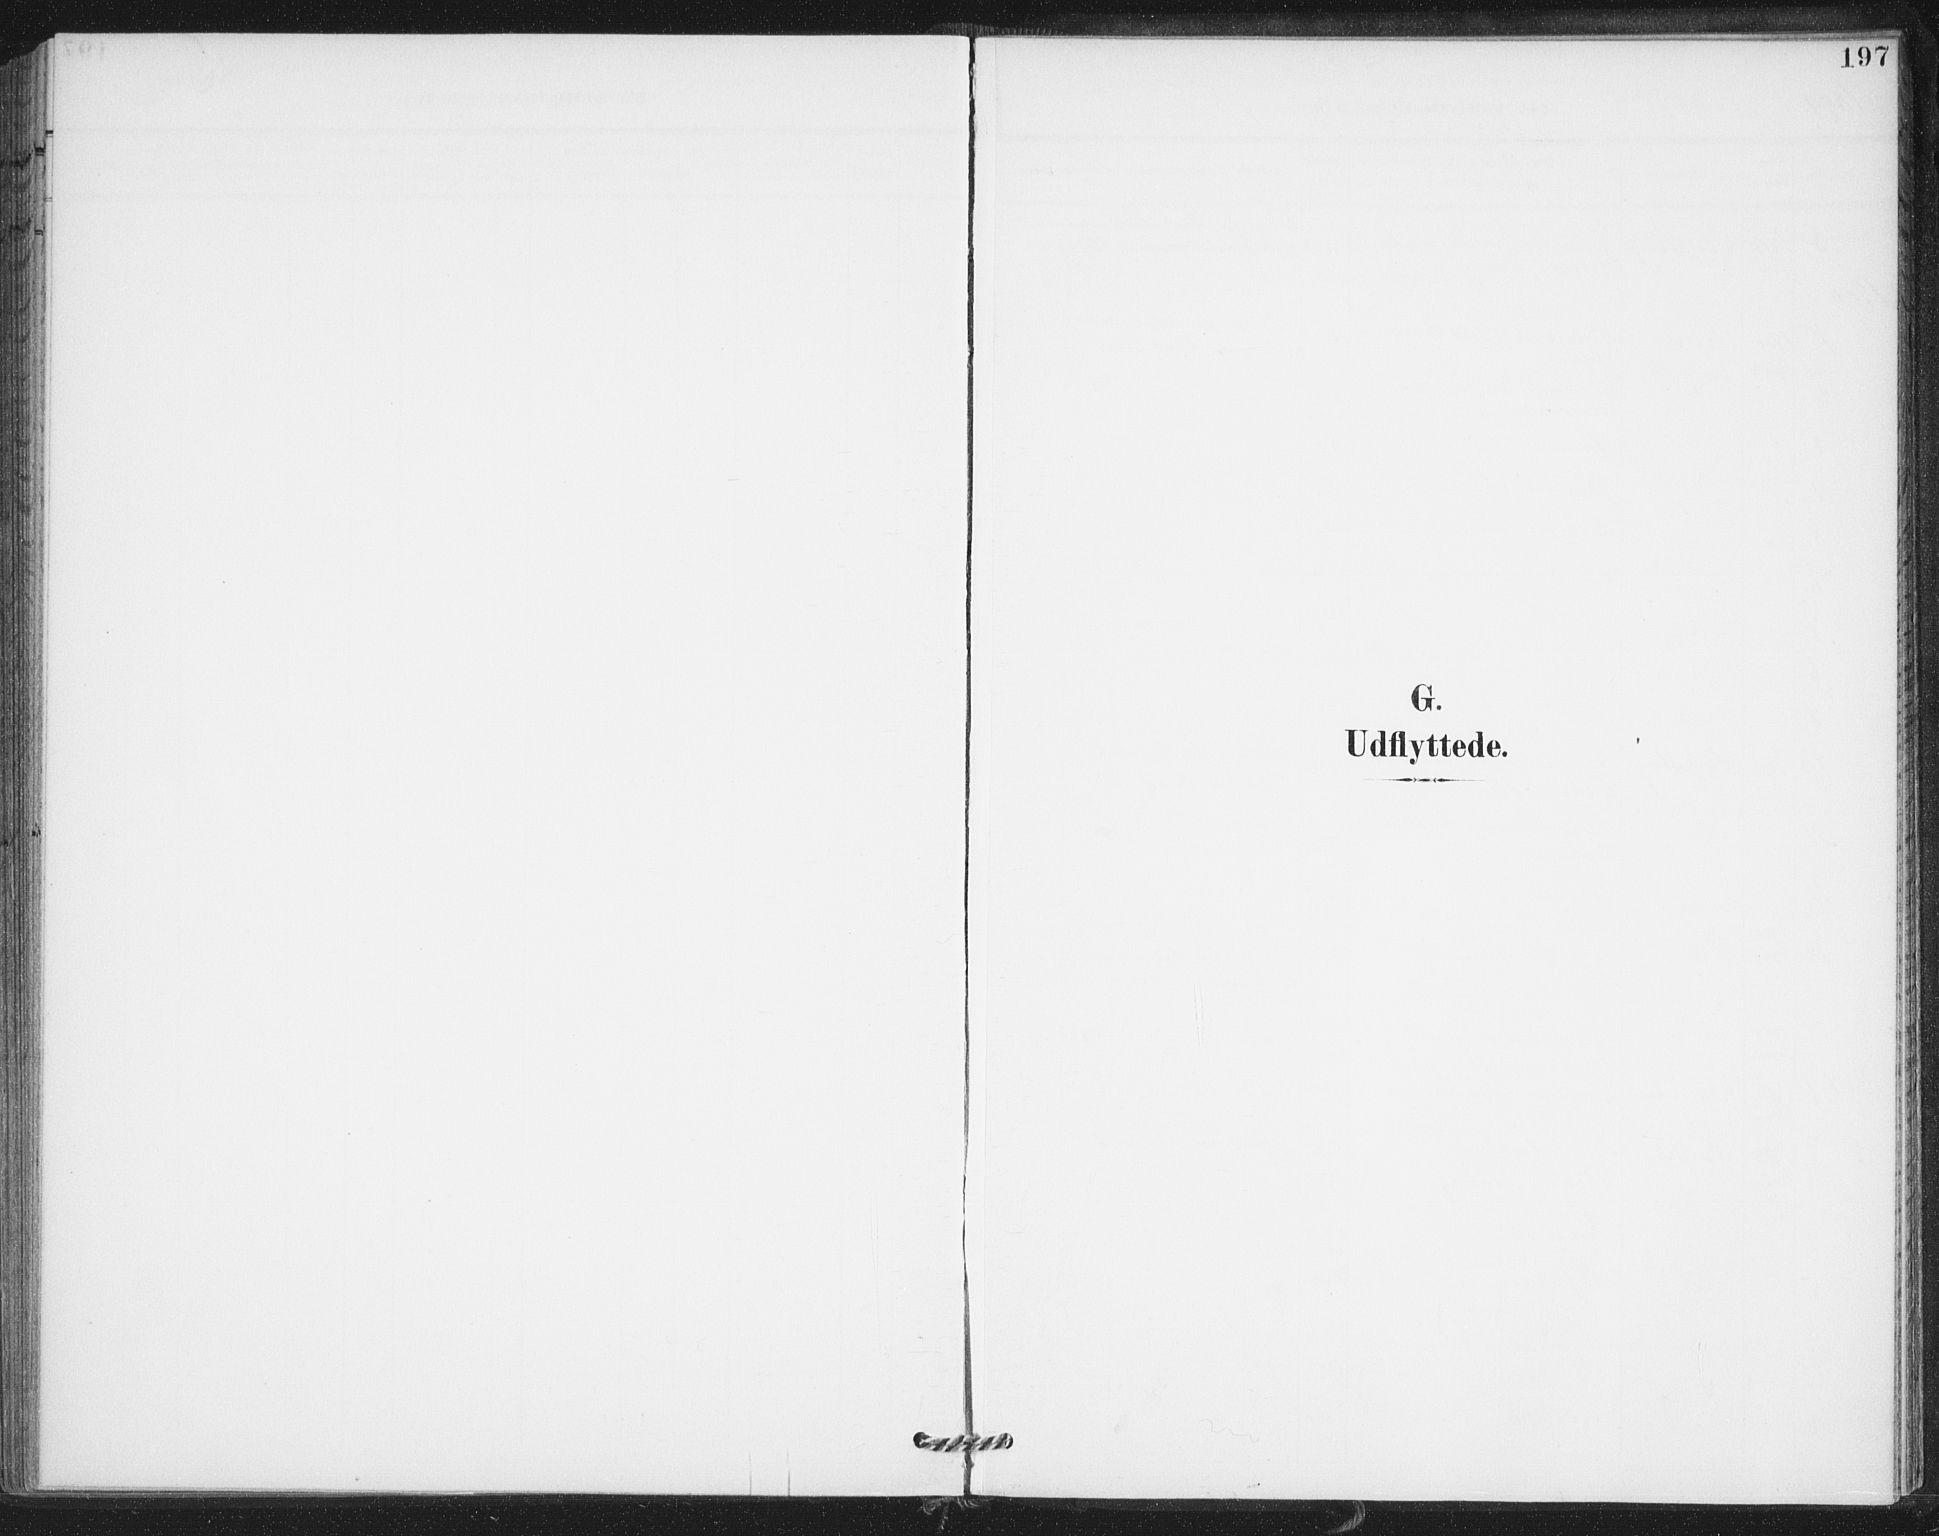 SAO, Varteig prestekontor Kirkebøker, F/Fa/L0003: Ministerialbok nr. 3, 1899-1919, s. 197